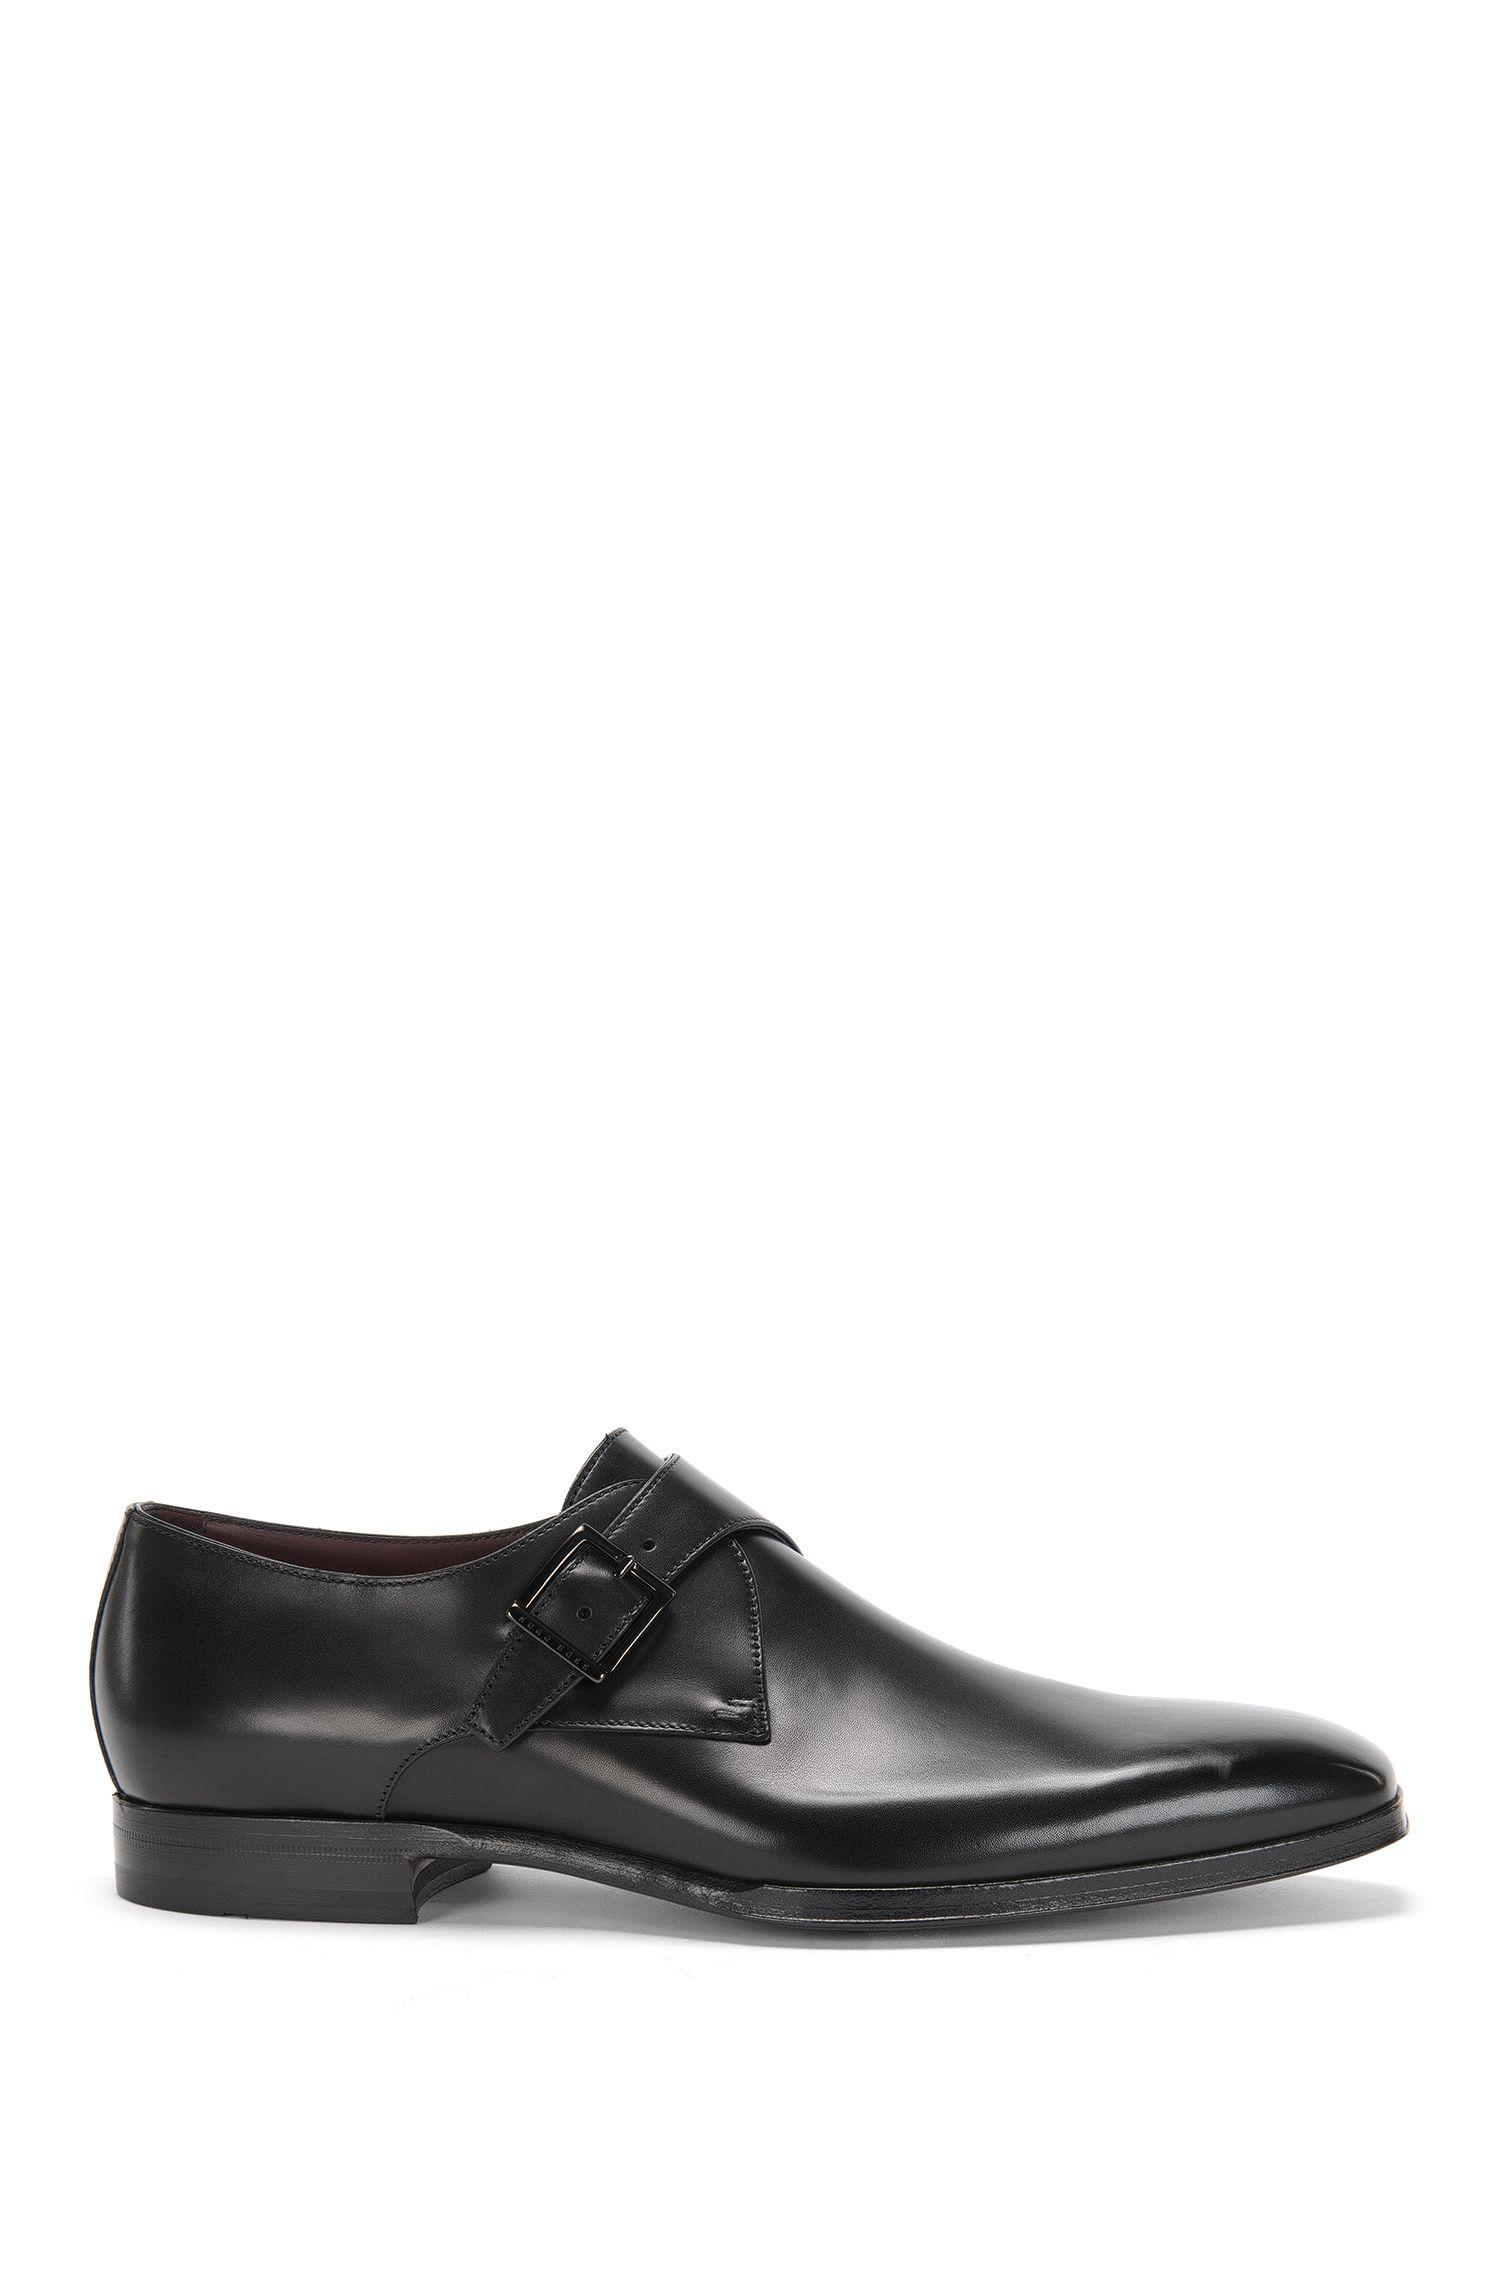 'T-Club Monk Itpt'   Italian Calfskin Monk Strap Dress Shoes